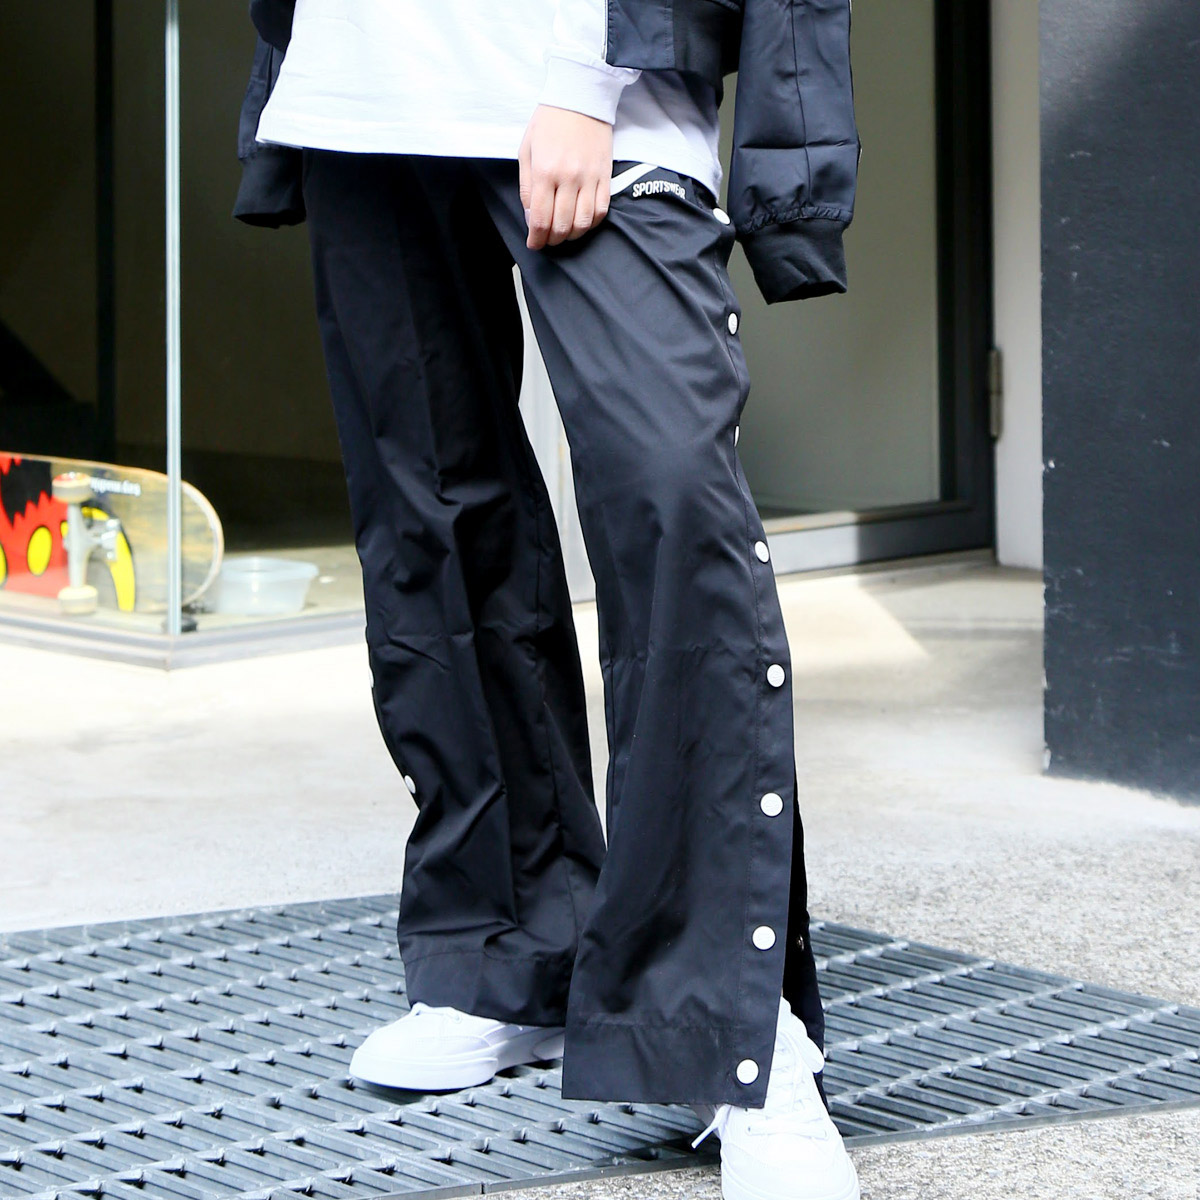 NIKE AS W NSW PANT SNAP ARCHIVE(ナイキ ウィメンズ アーカイブ スナップ パンツ)BLACK/SAIL【レディース パンツ】18SP-I